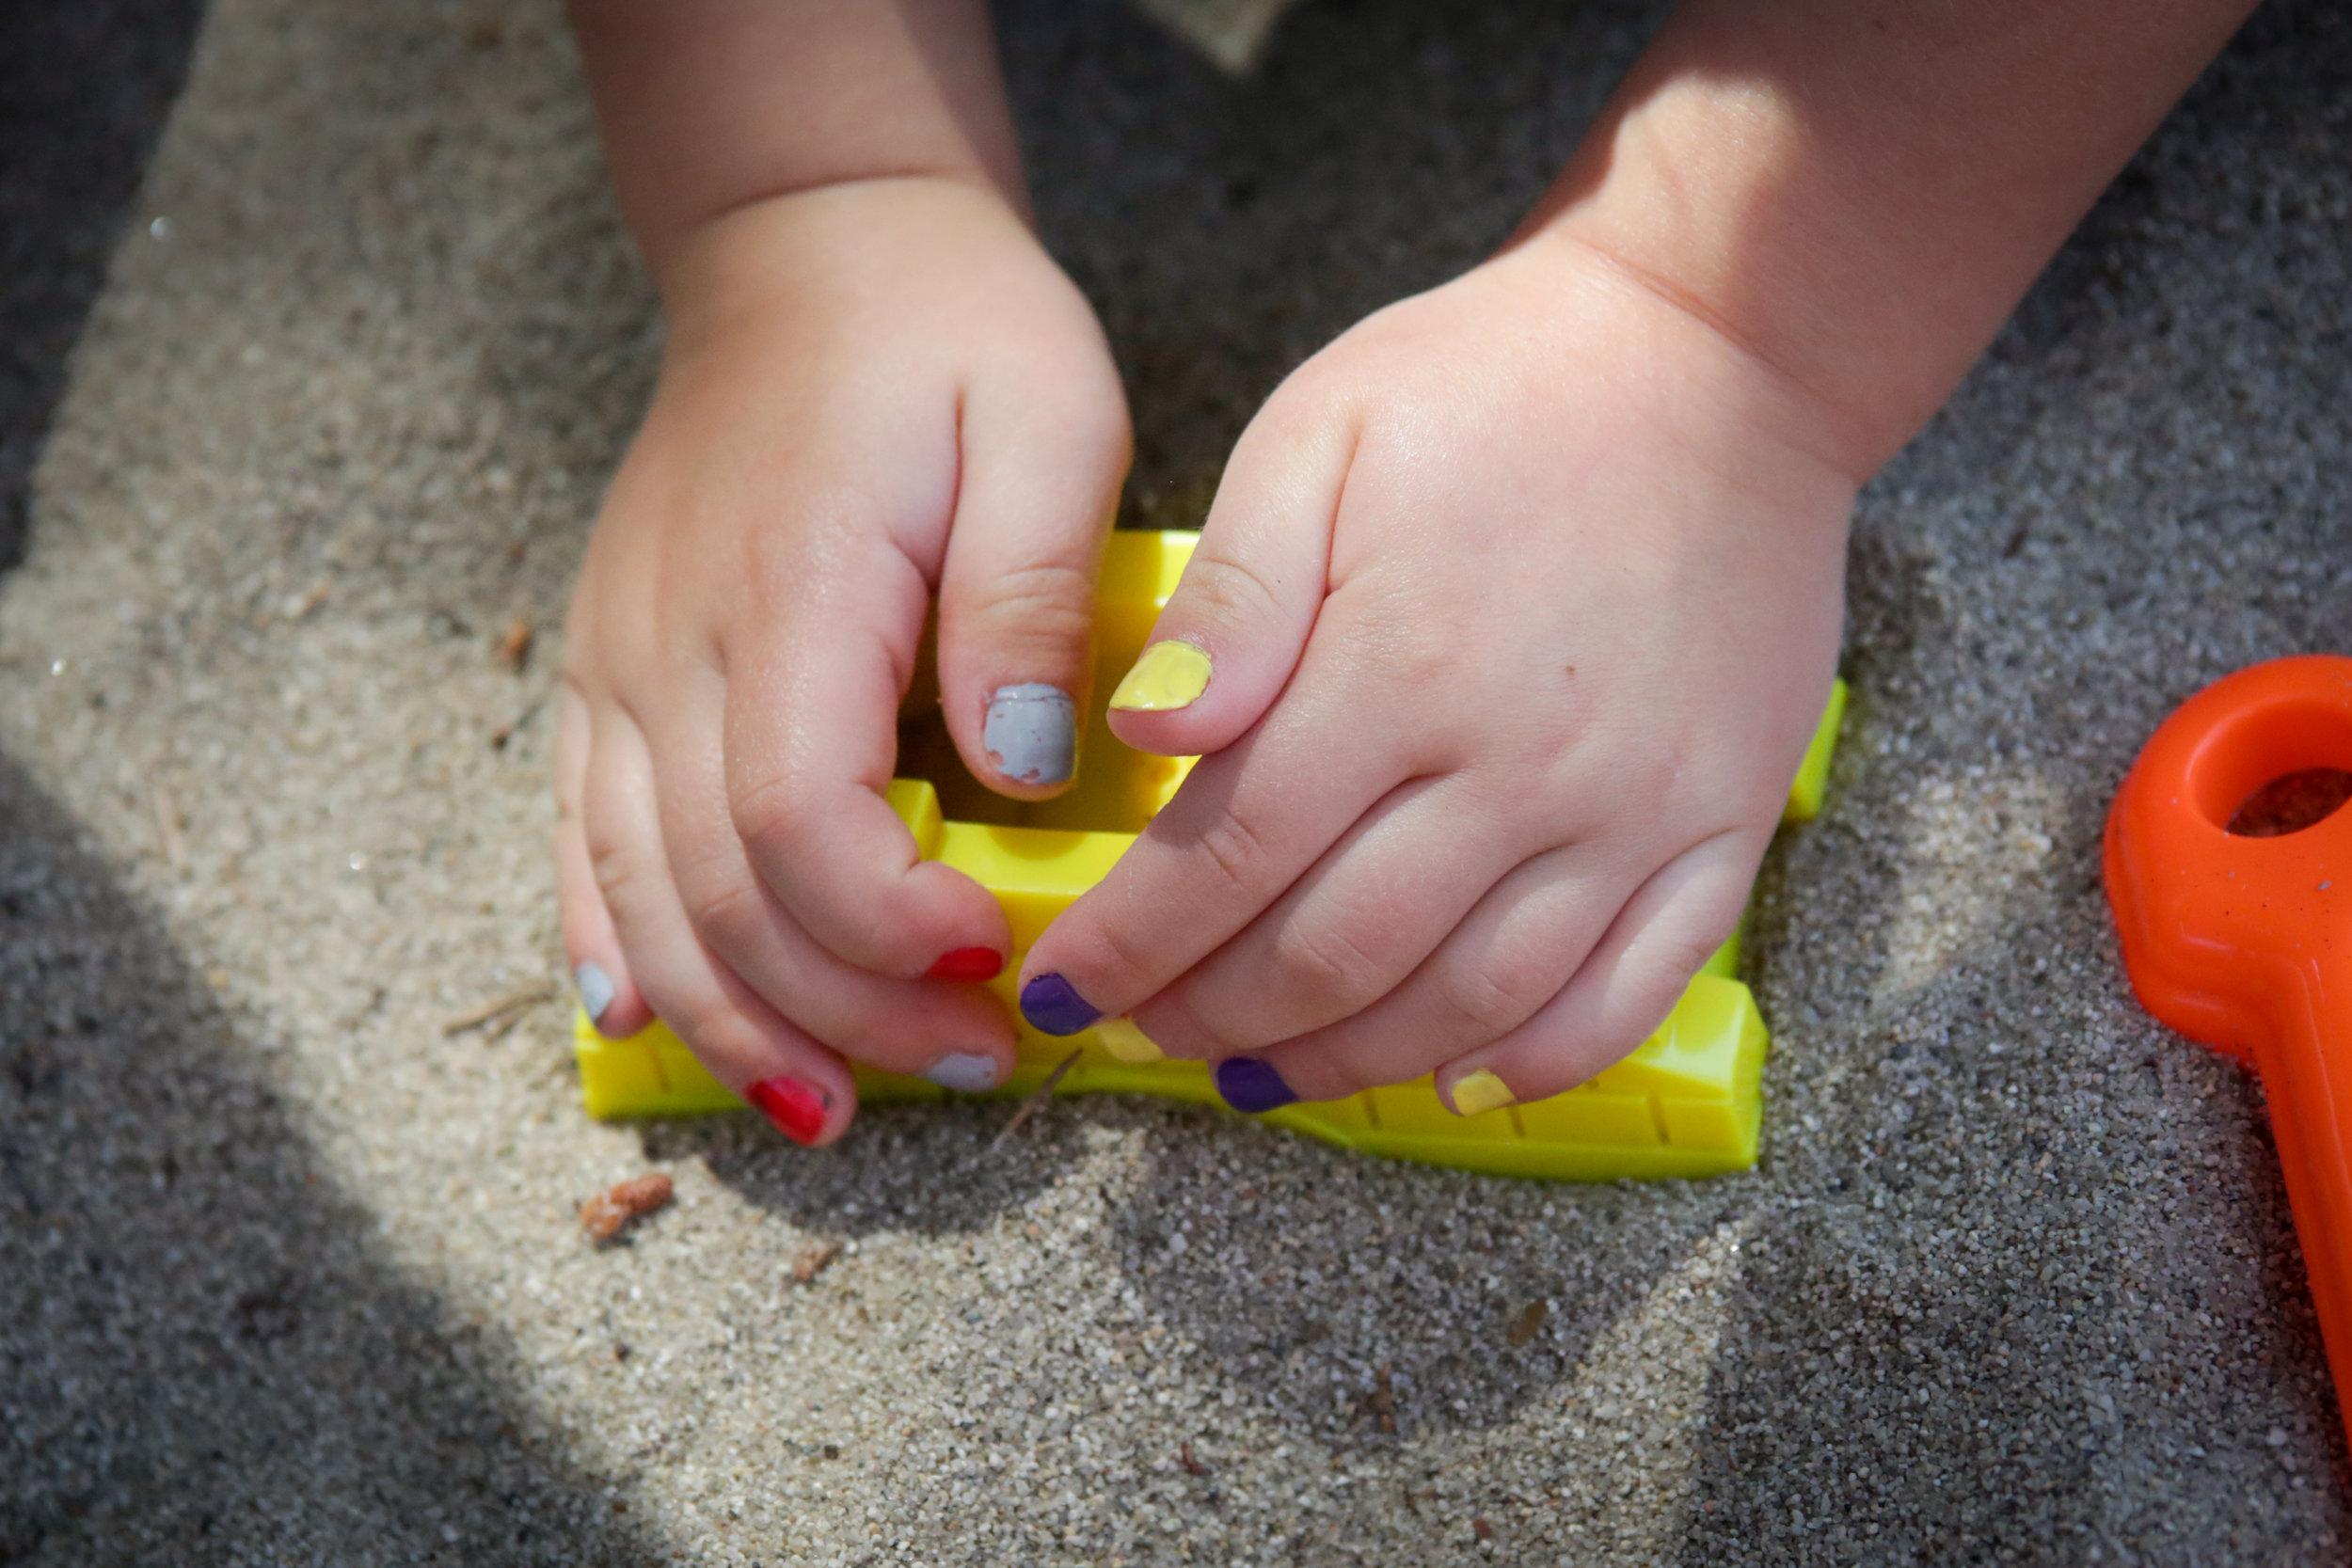 safe nail polish